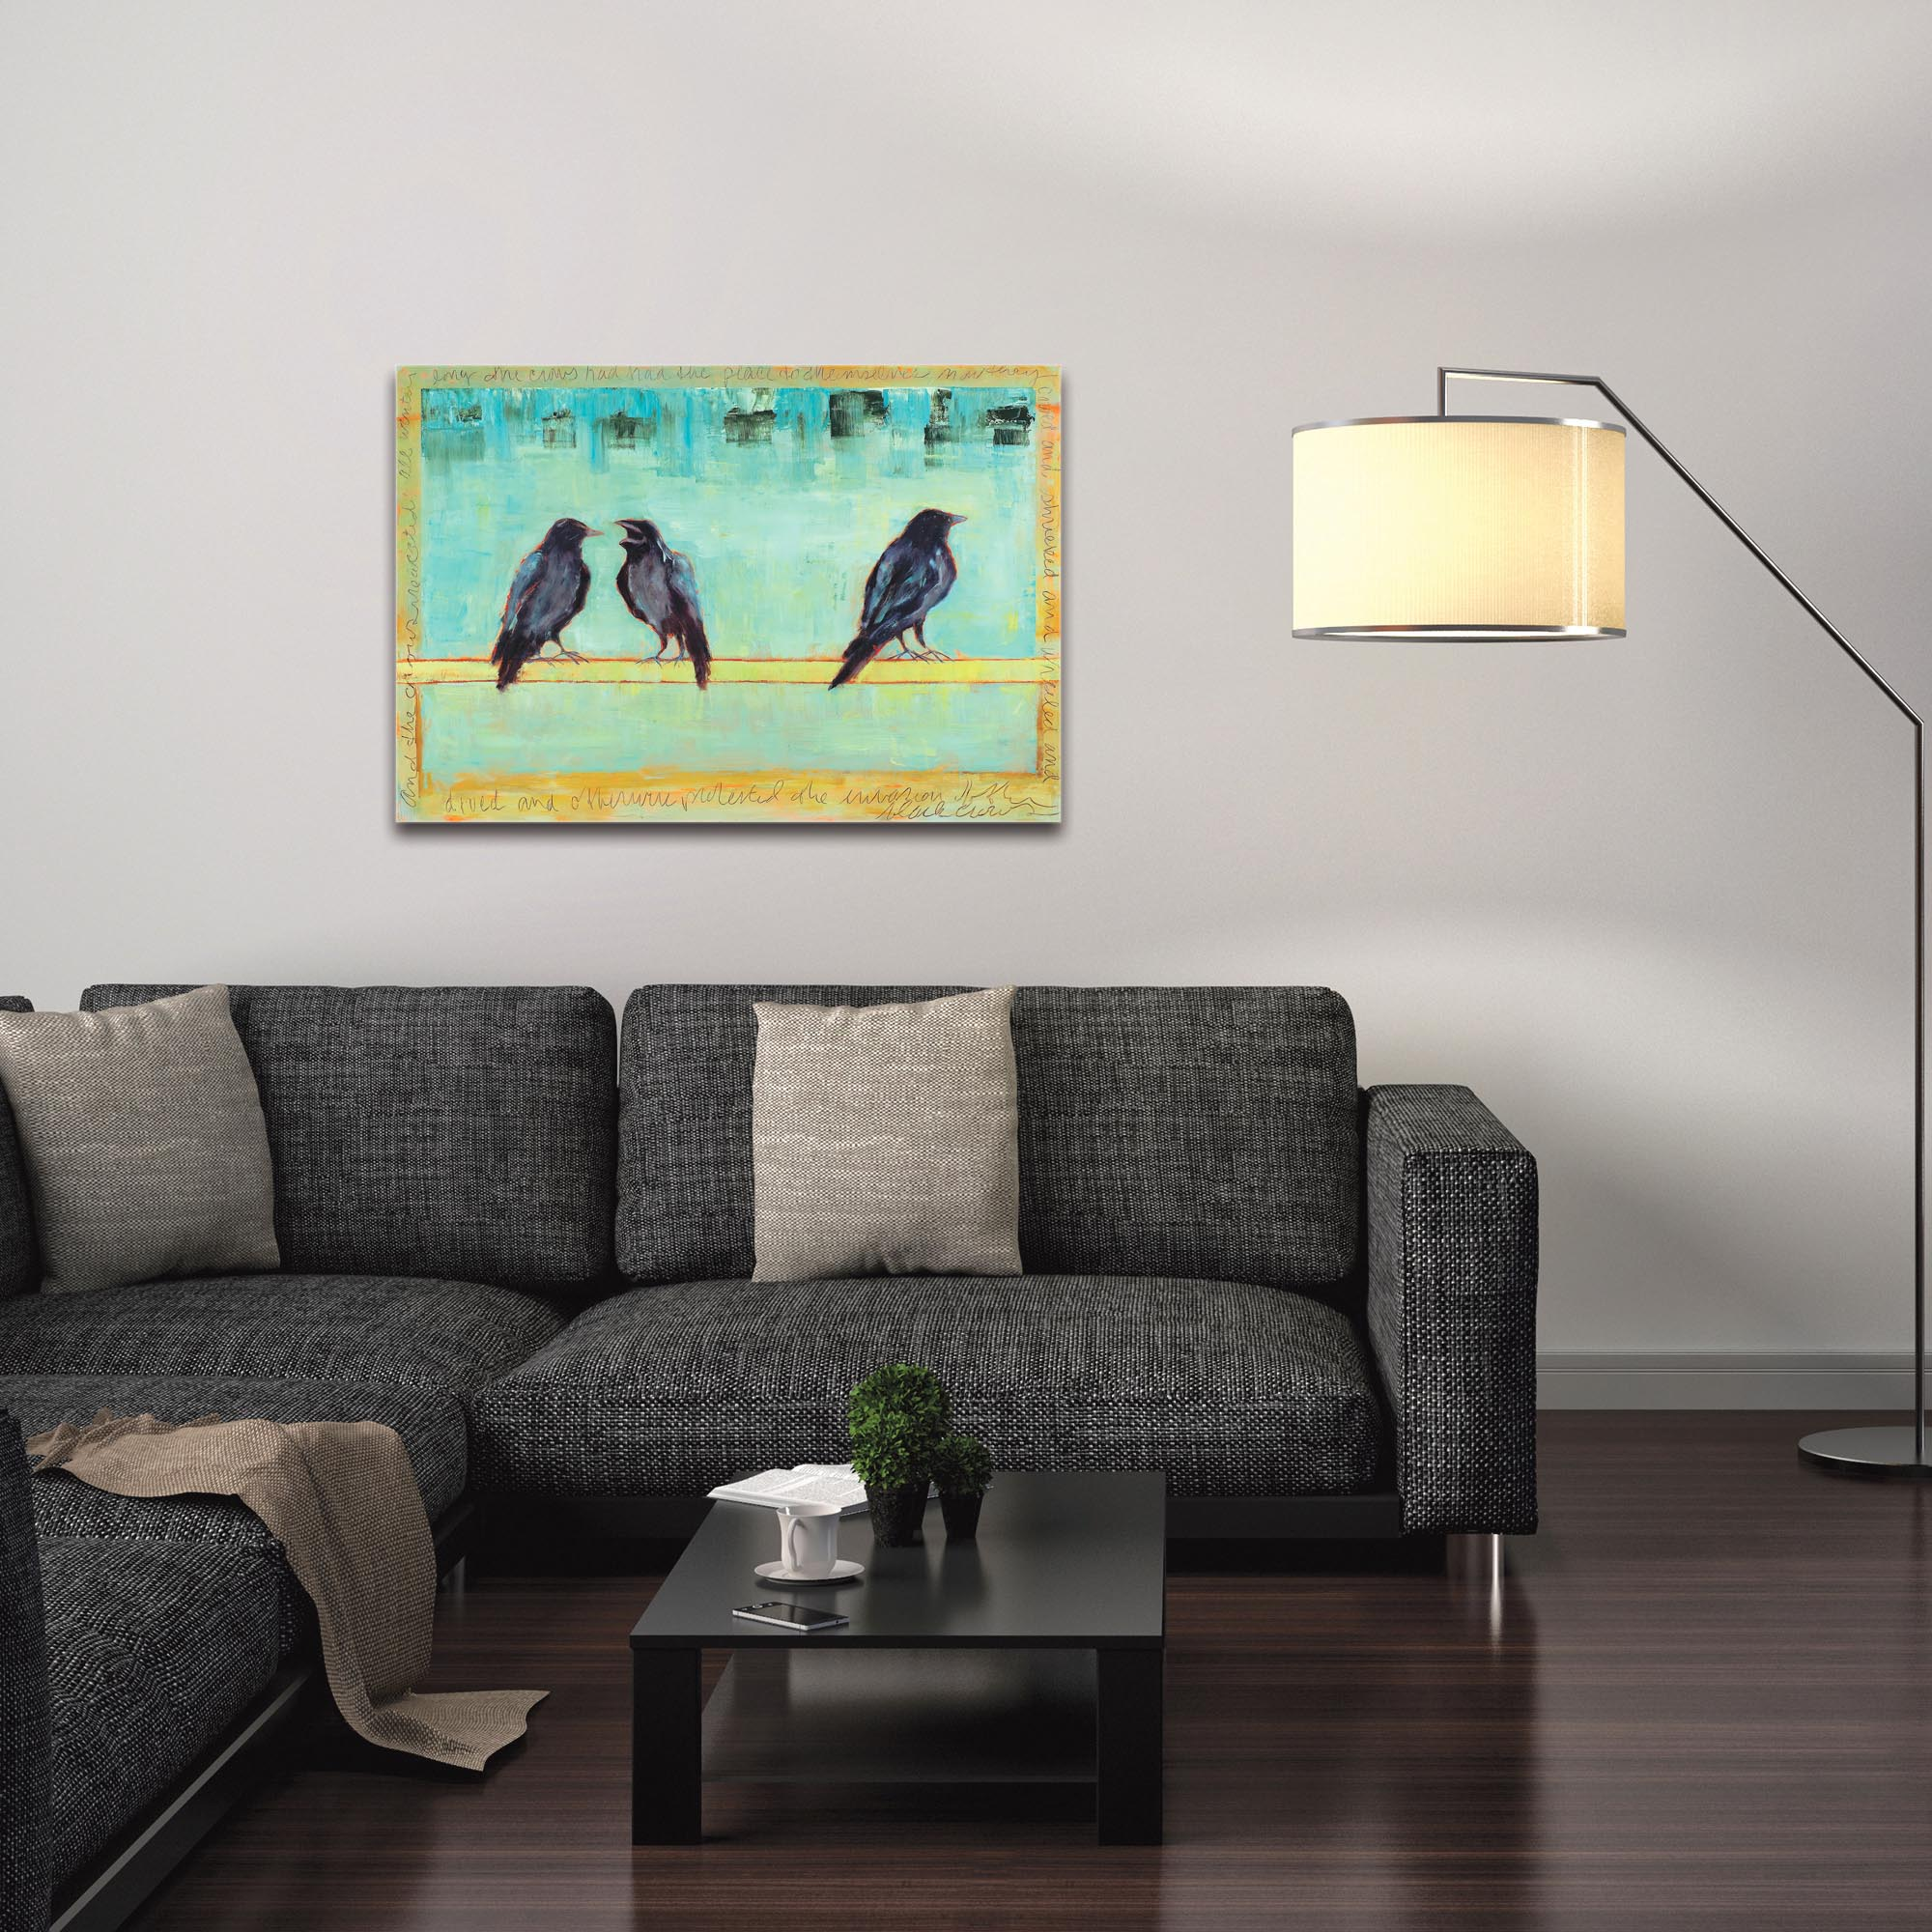 Contemporary Wall Art 'Crow Bar 2' - Urban Birds Decor on Metal or Plexiglass - Image 3